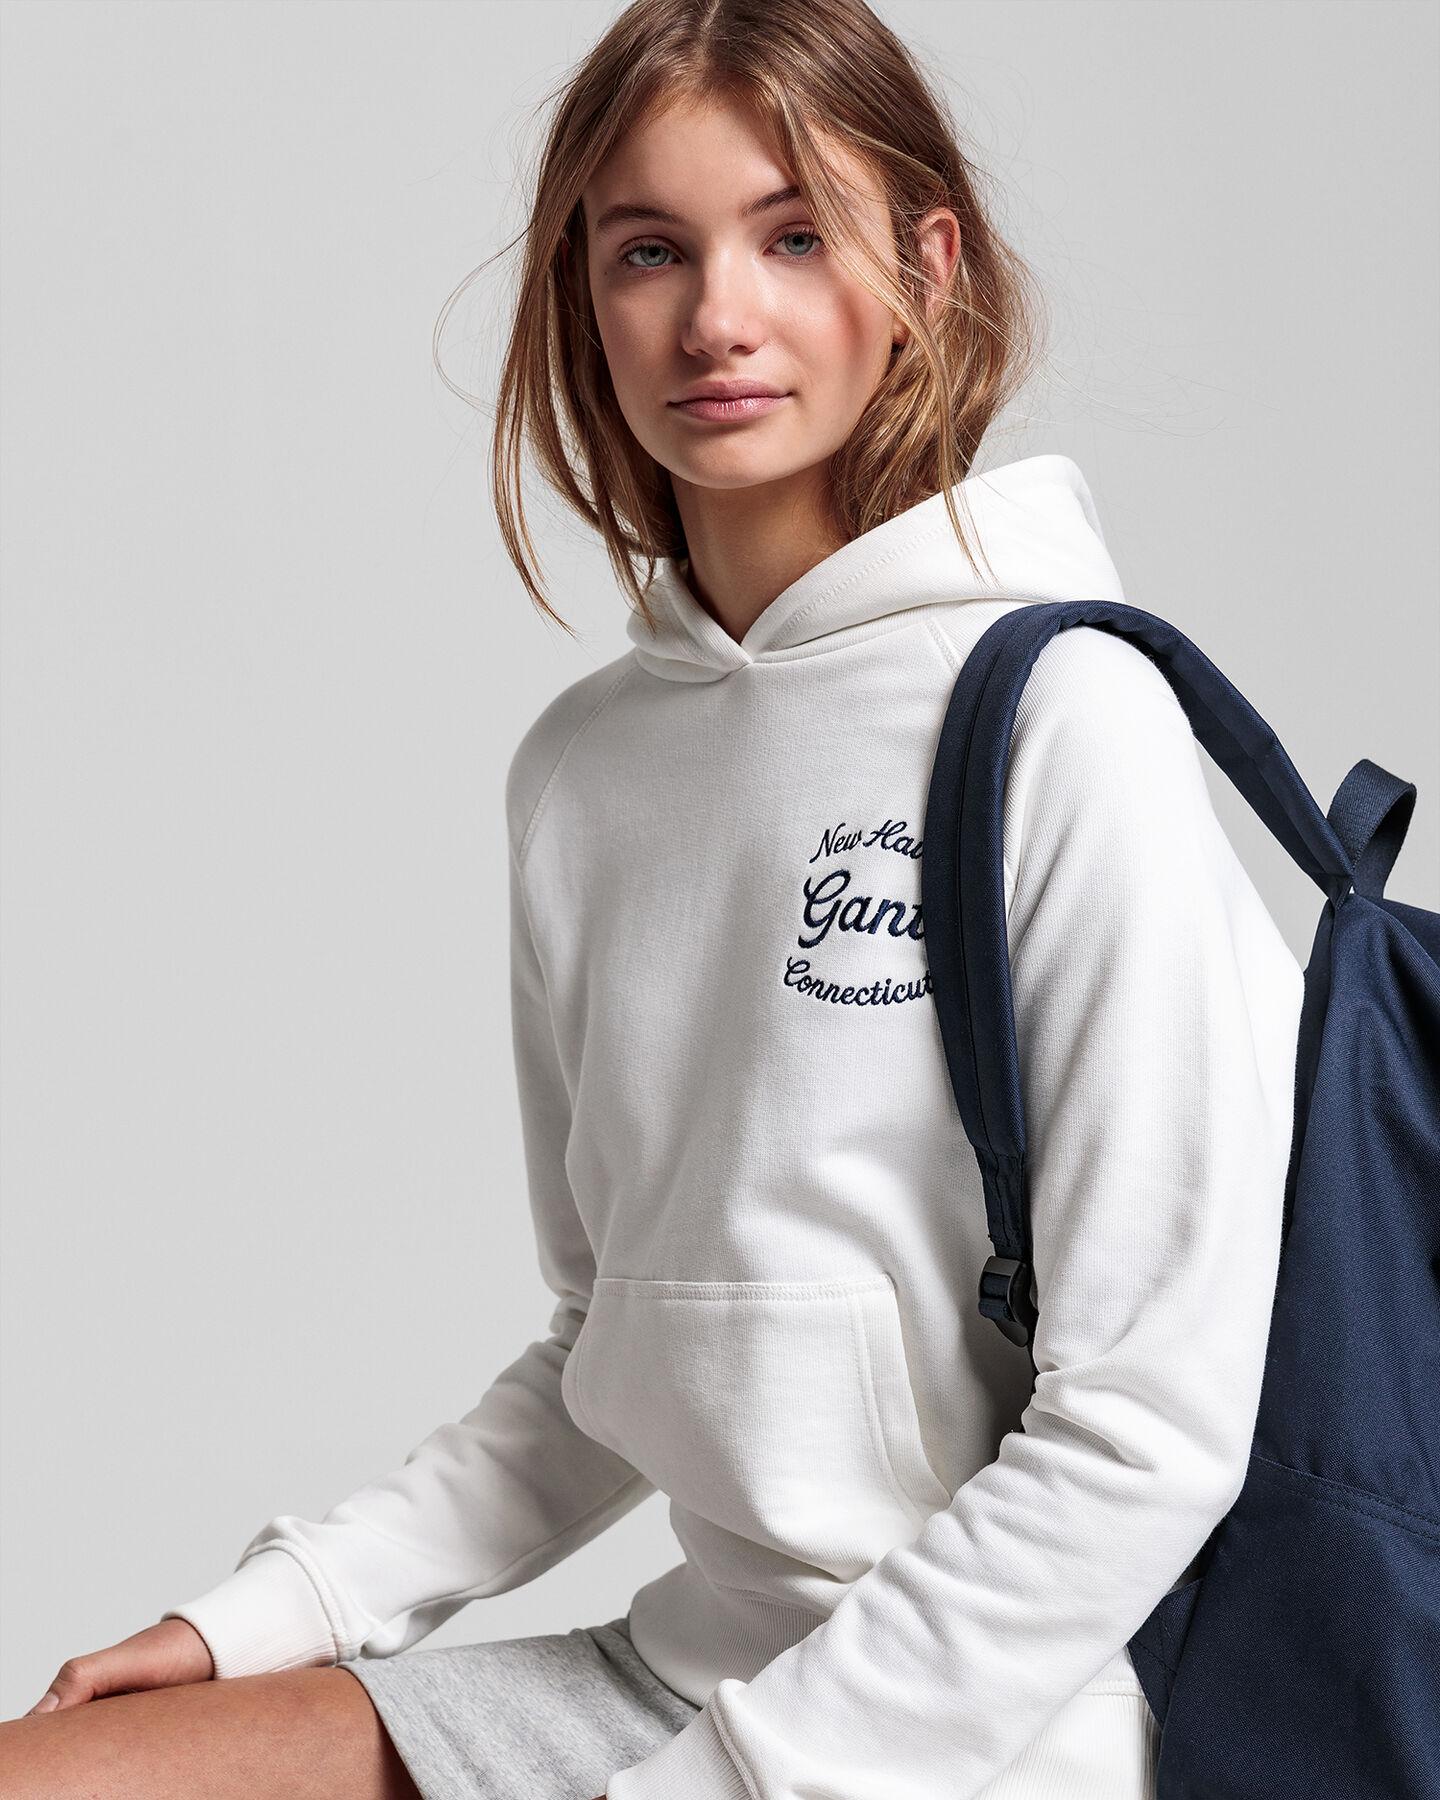 Teen Girls Logo Hoodie mit Schriftzug